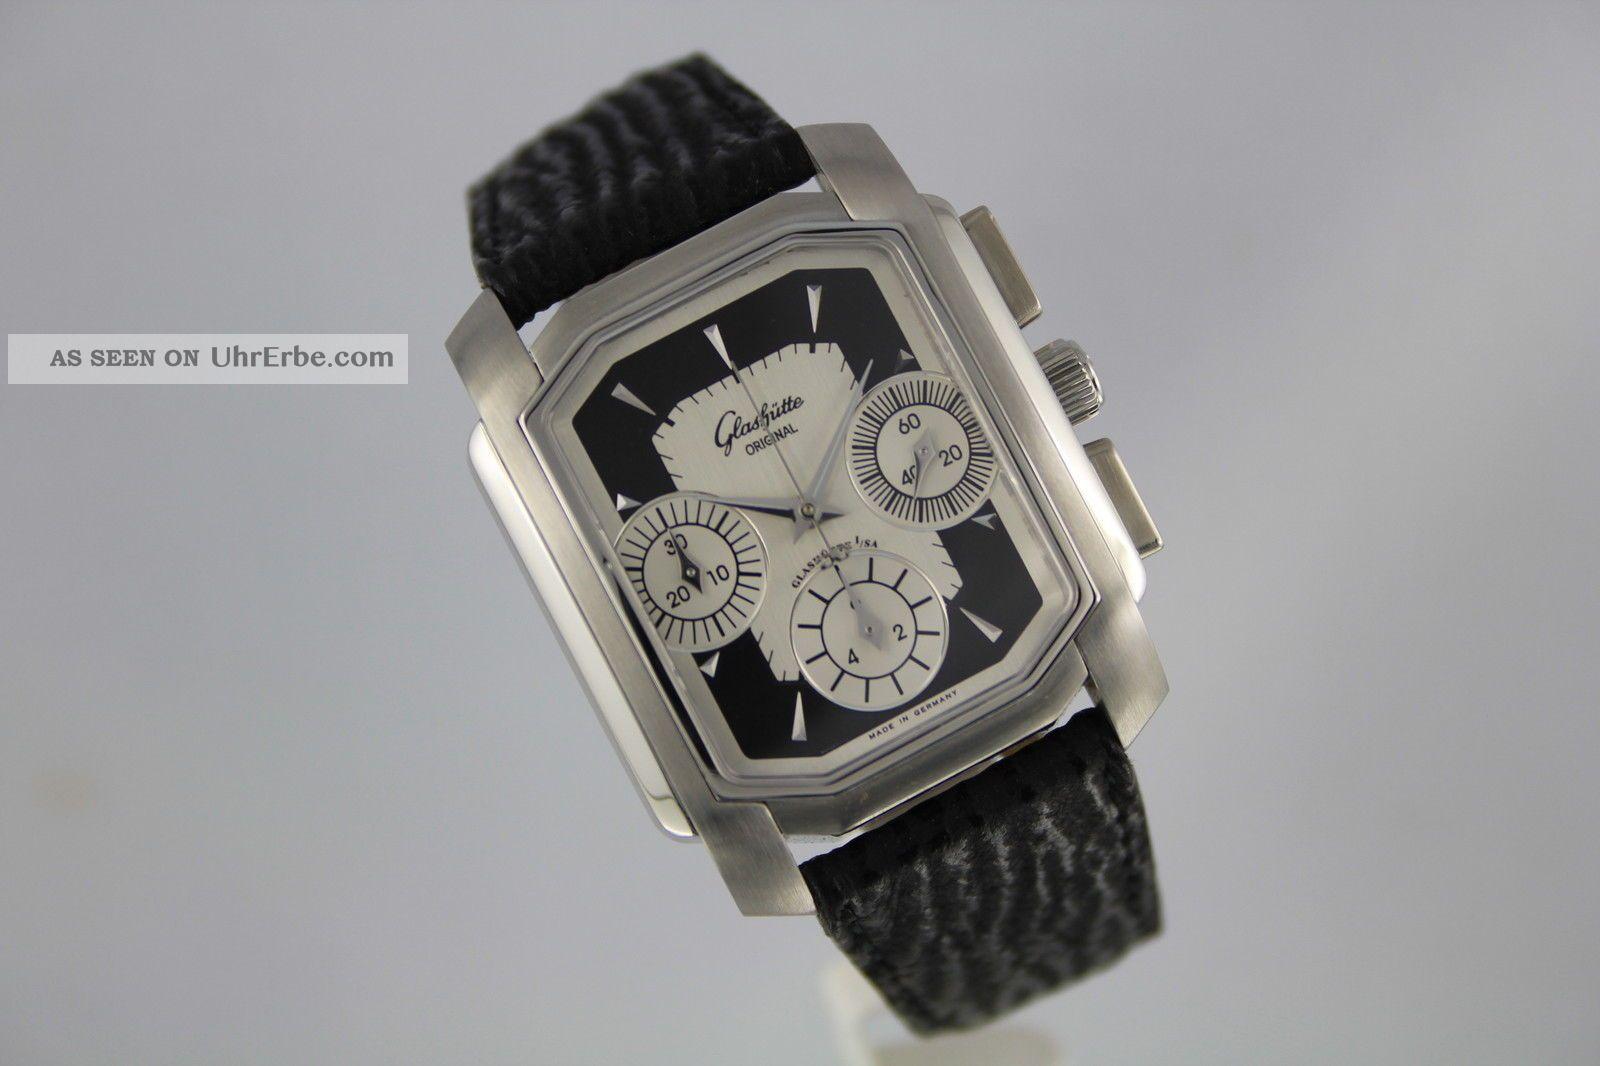 Glashütte Senator Karree Chronograph - Edelstahl Referenz 39 - 31 - 17 - 04 - 14 Armbanduhren Bild